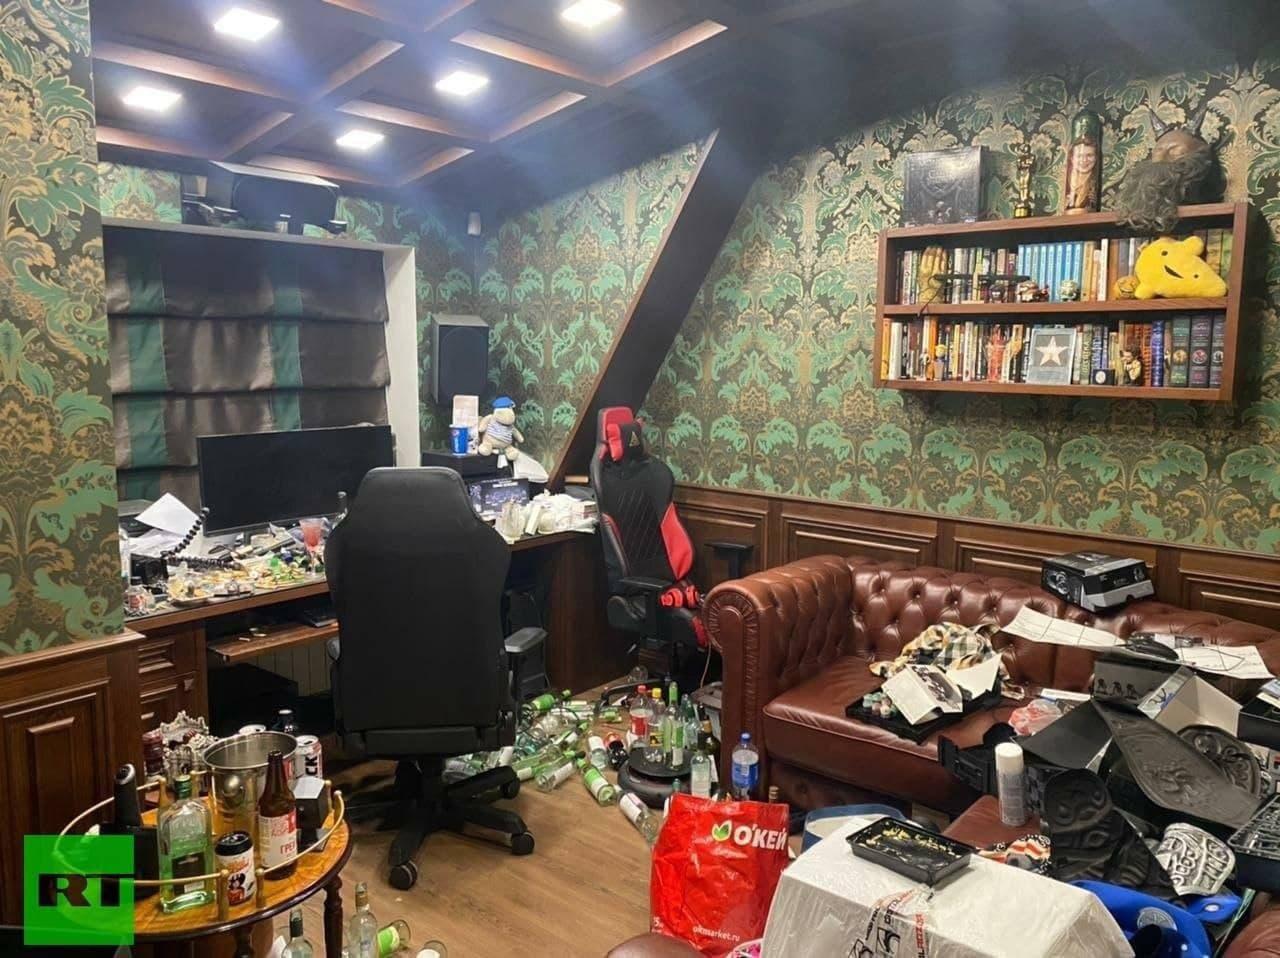 Юрий Хованский устроил в квартире помойку и притон